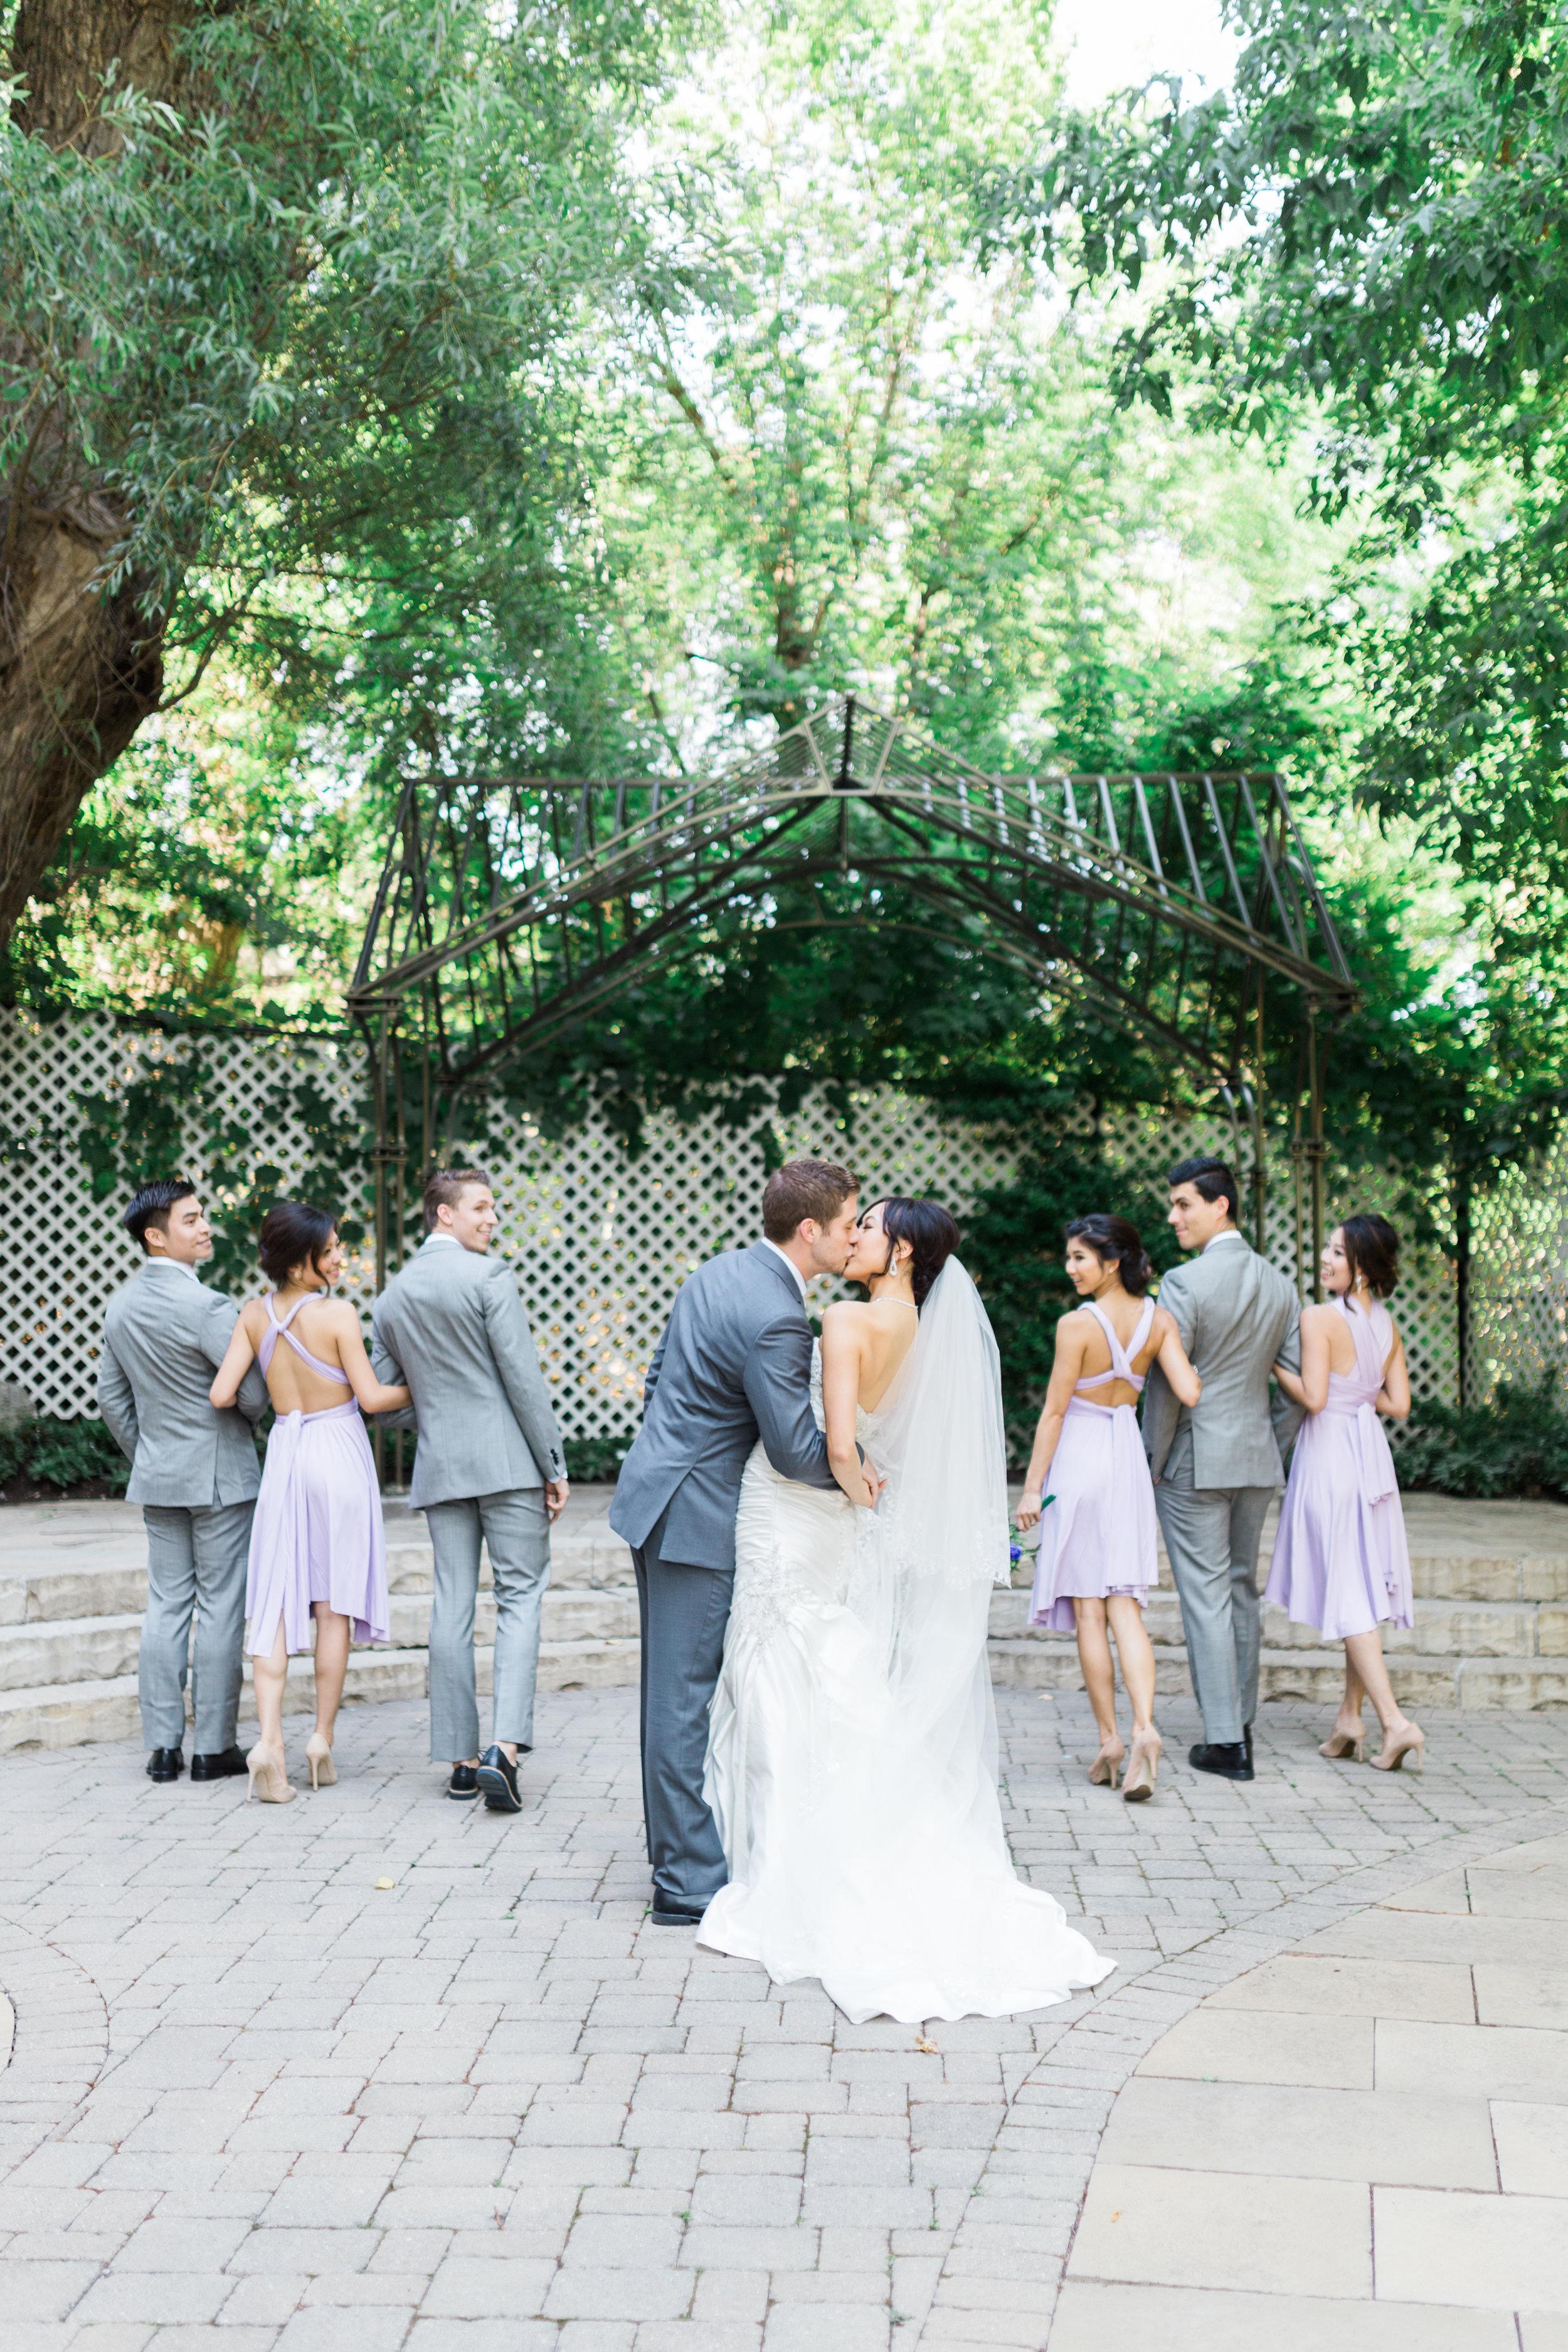 Toronto Fine Art Photographer - Old Mill Wedding - Bridal Party Photos-14.jpg